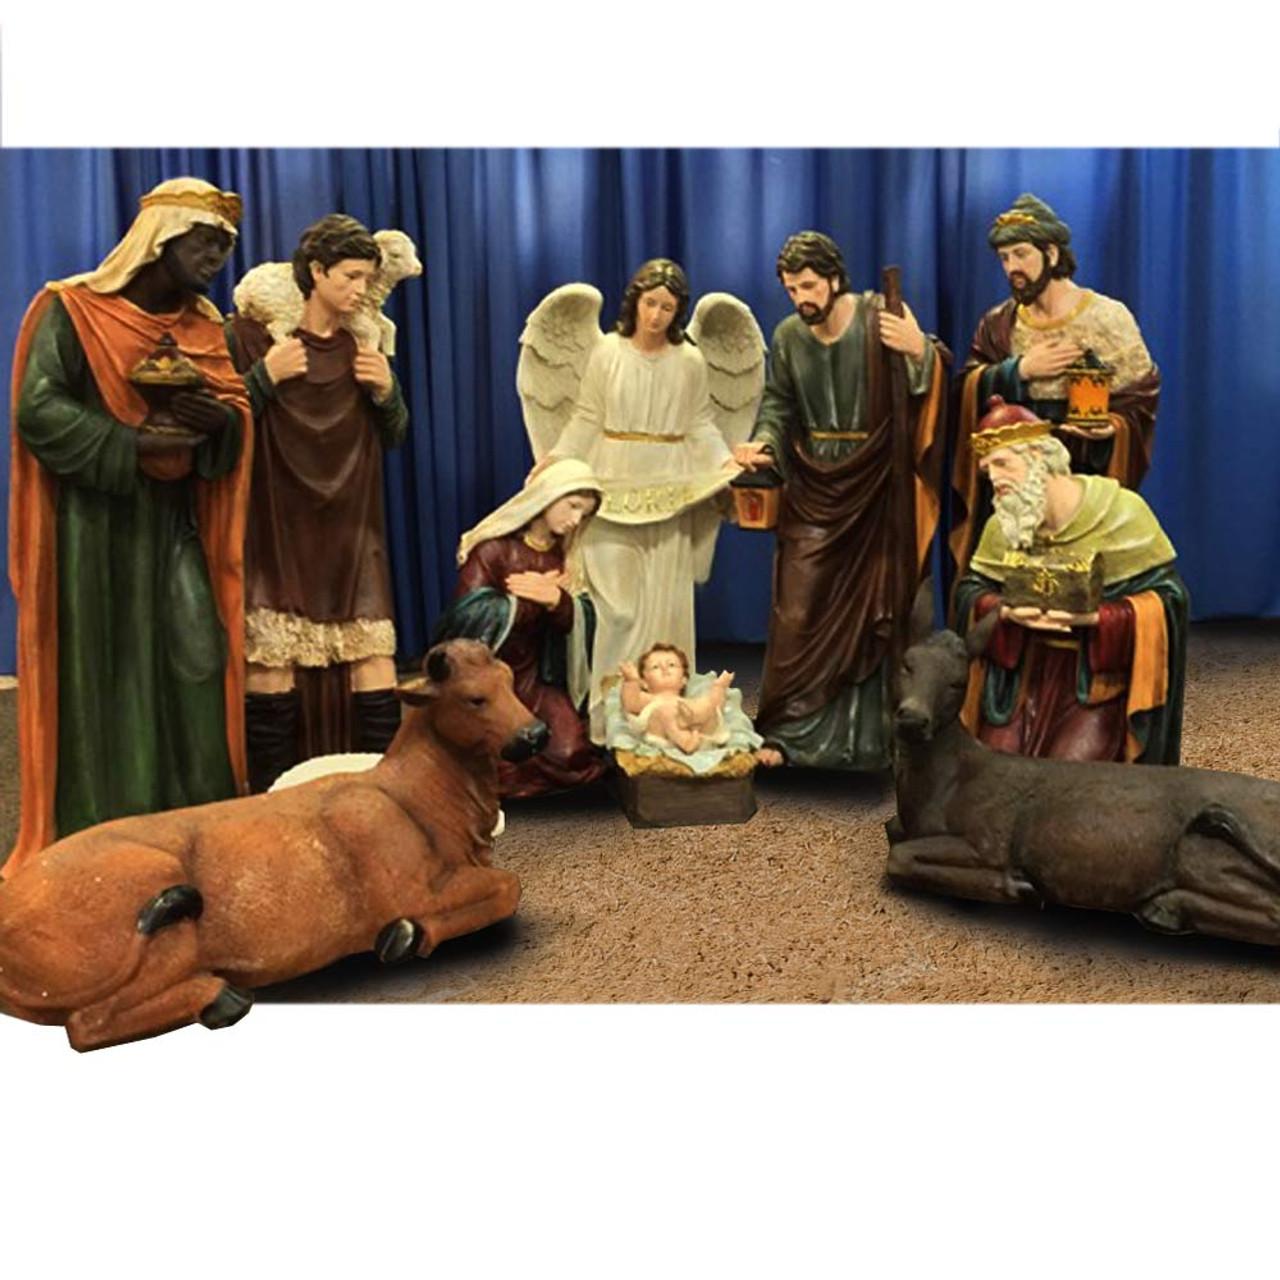 "53396 12pc Fiberglass/Resin Nativity Set 48"""